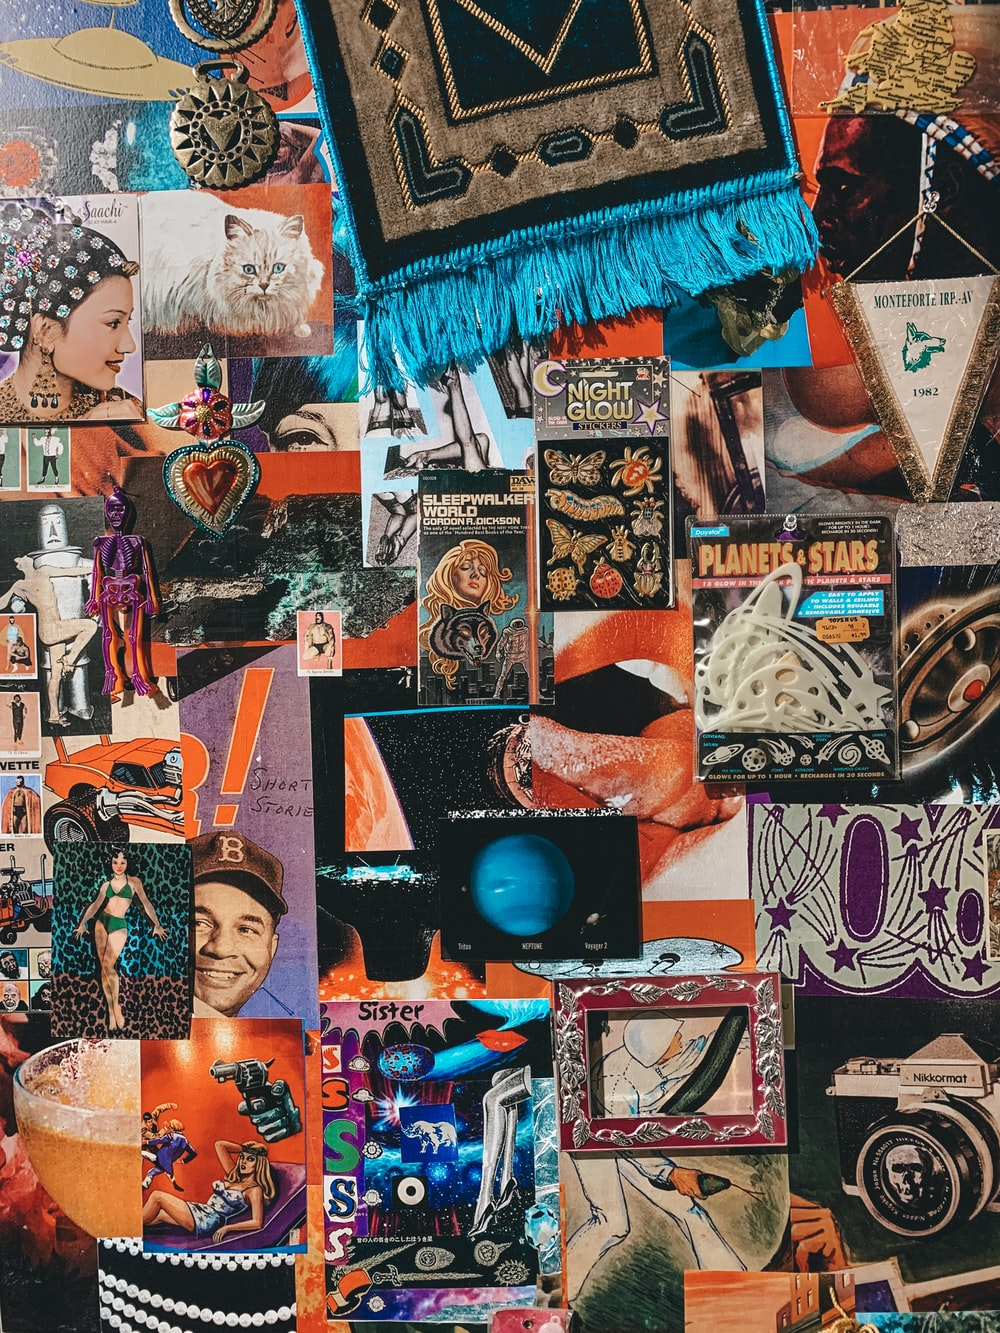 assorted wall art on wall